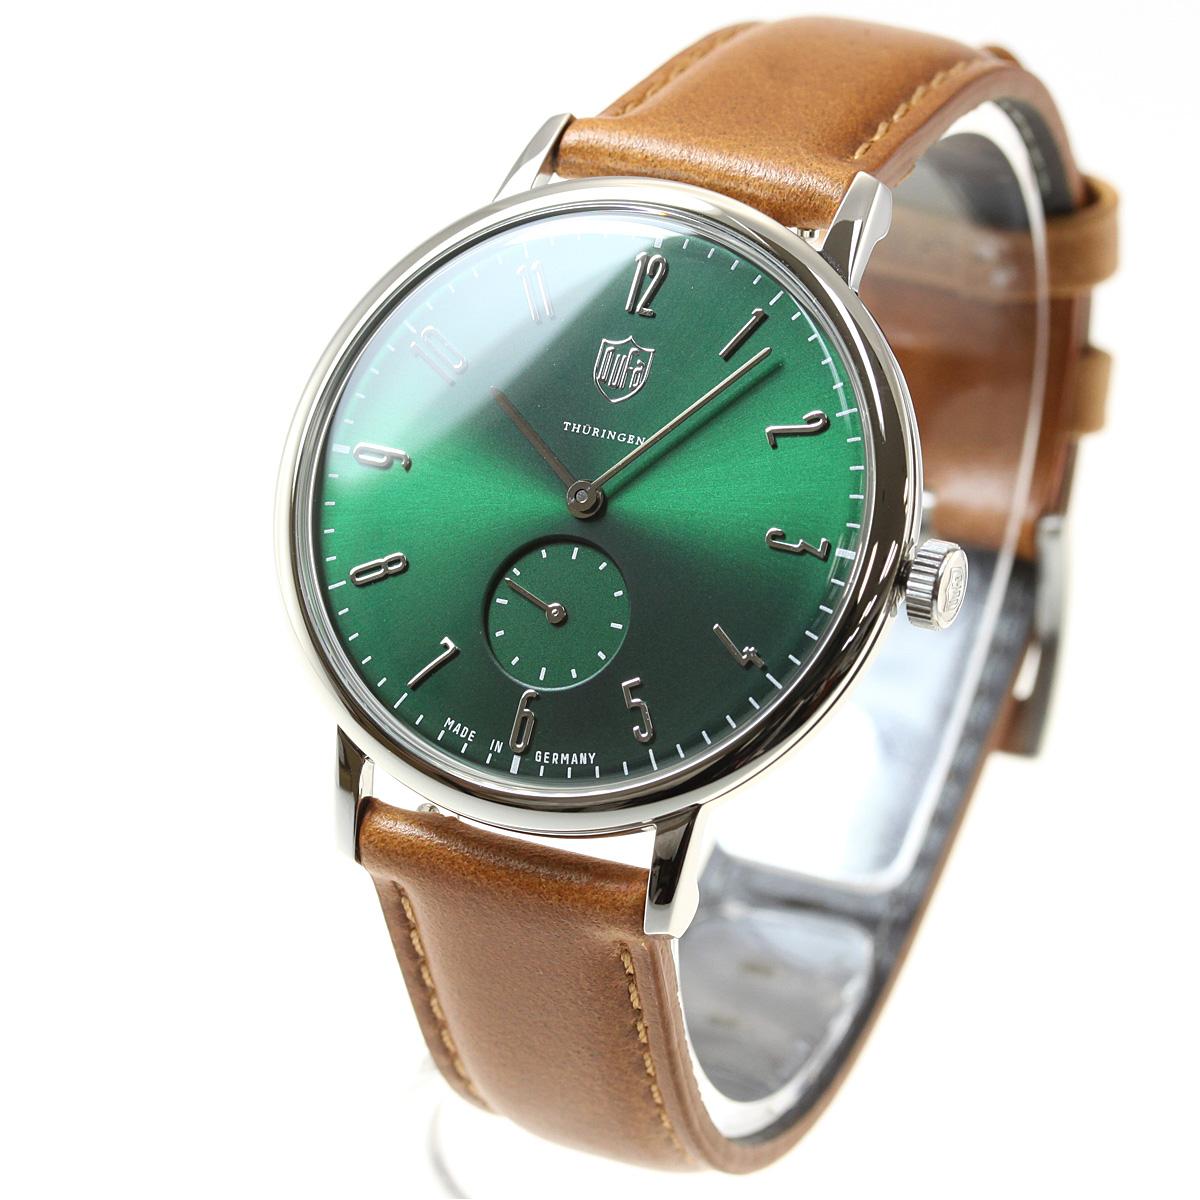 DUFA ドゥッファ 腕時計 メンズ グロピウス GROPIUS DF-9001-0M